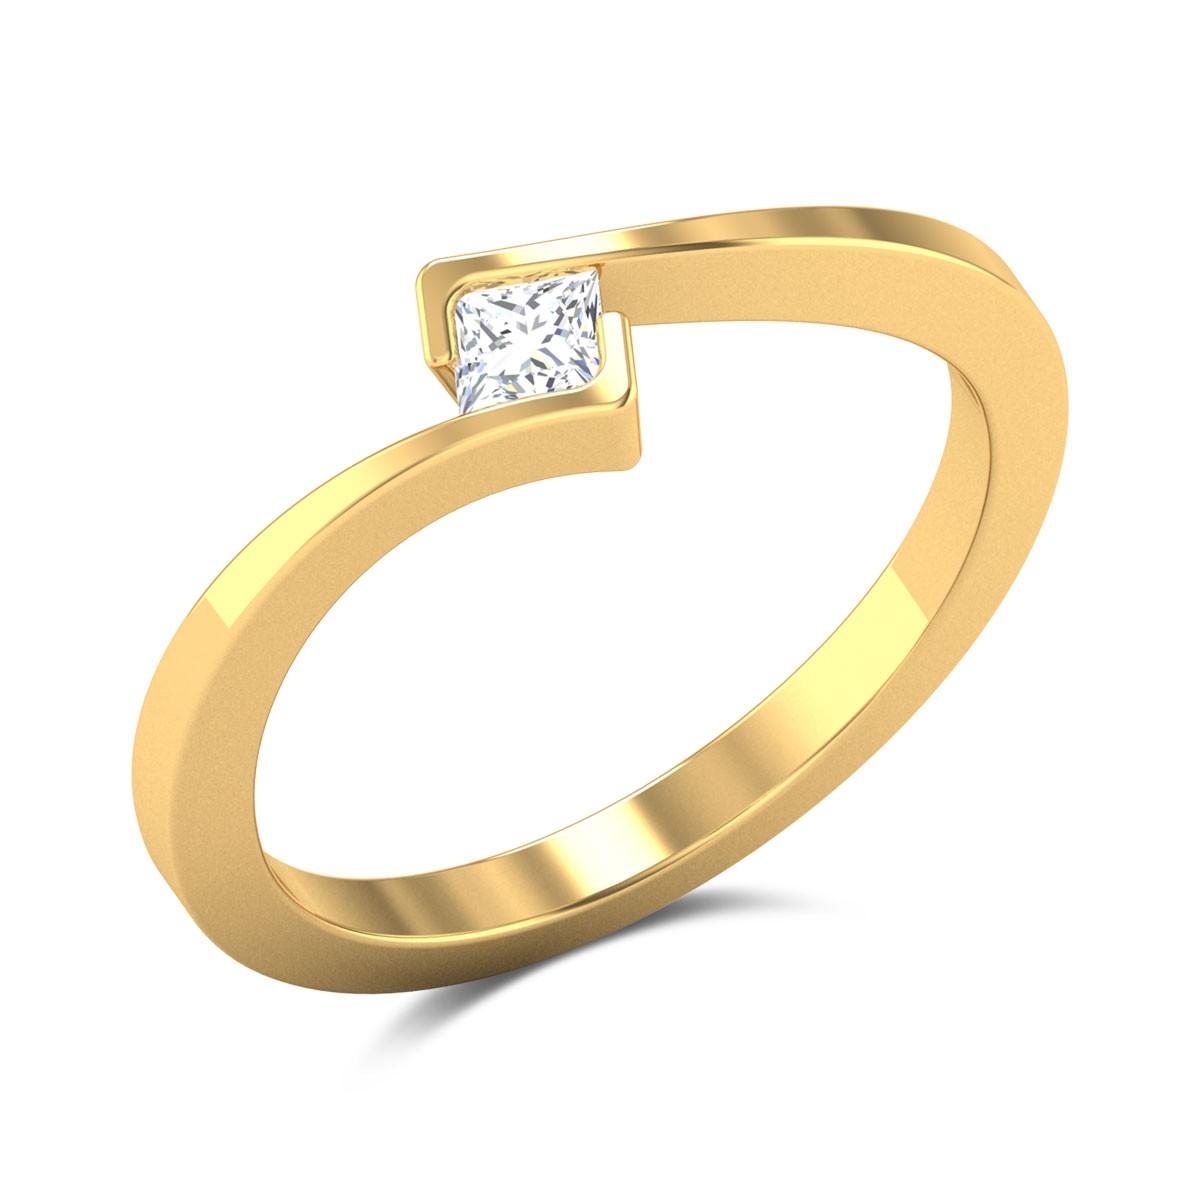 Gittel Princess Cut Solitaire Ring